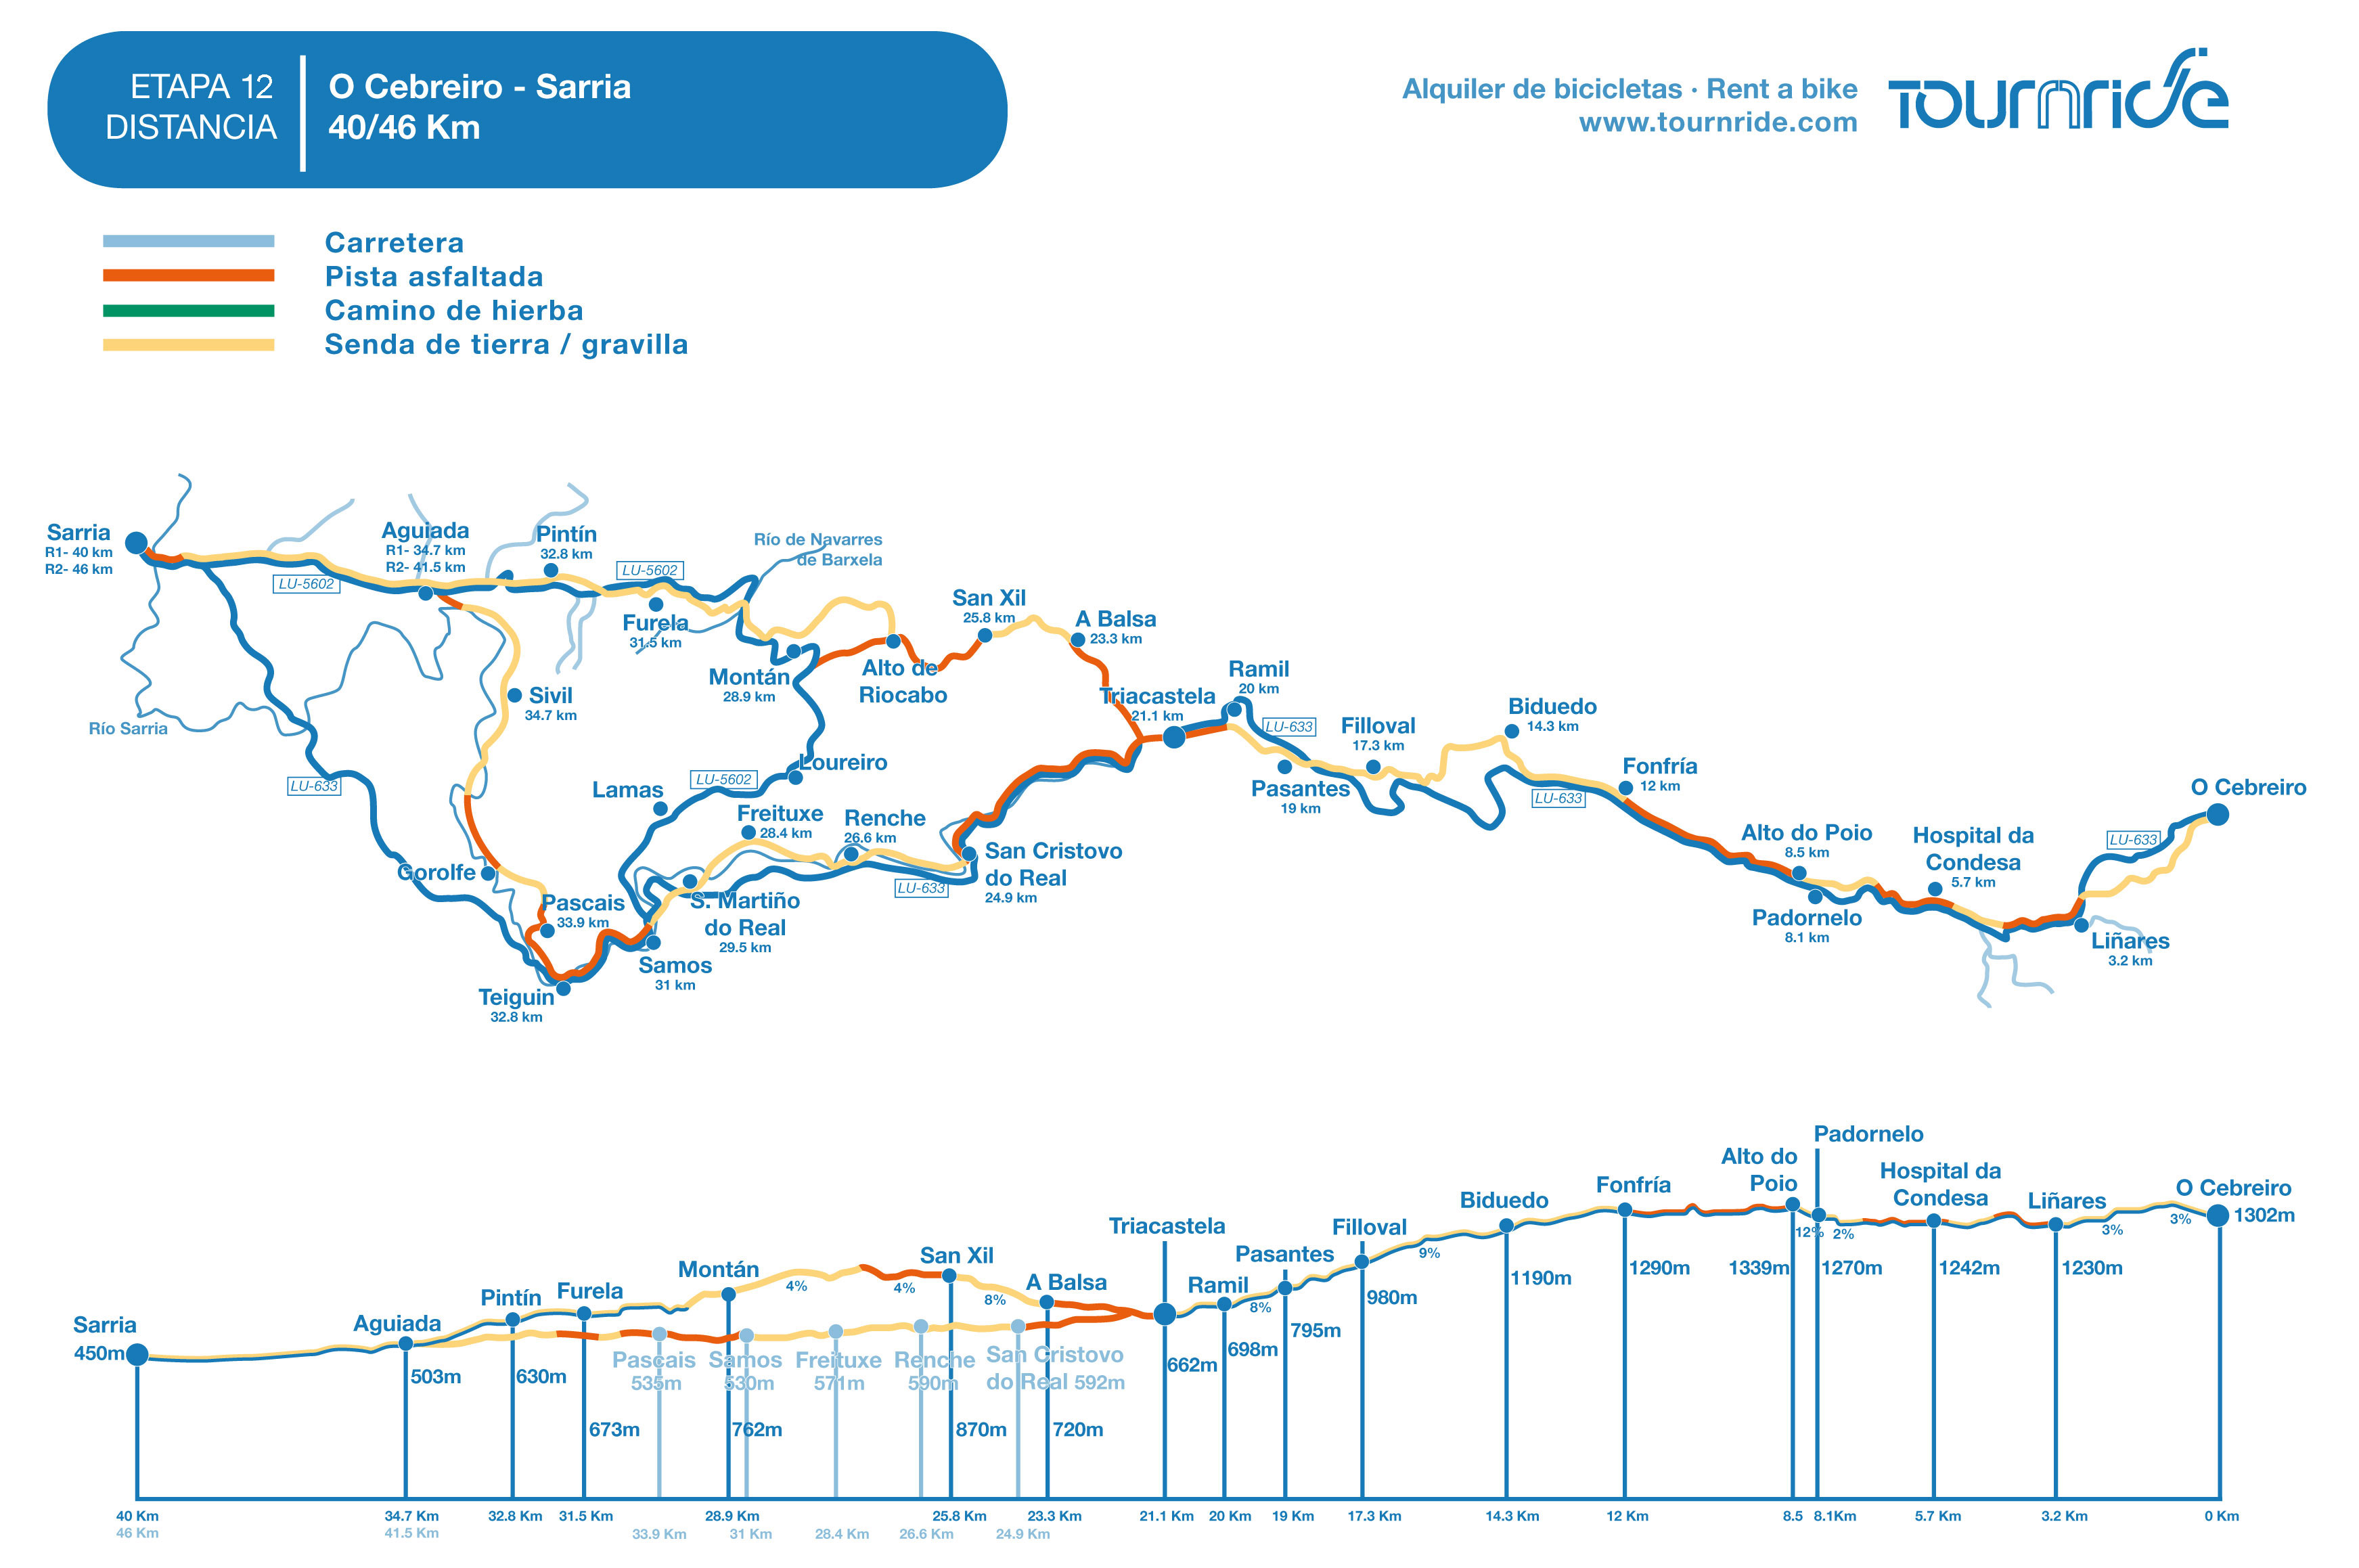 Mapa de la etapa 12 del Camino Francés en bicicleta desde O Cebreiro hasta Sarria